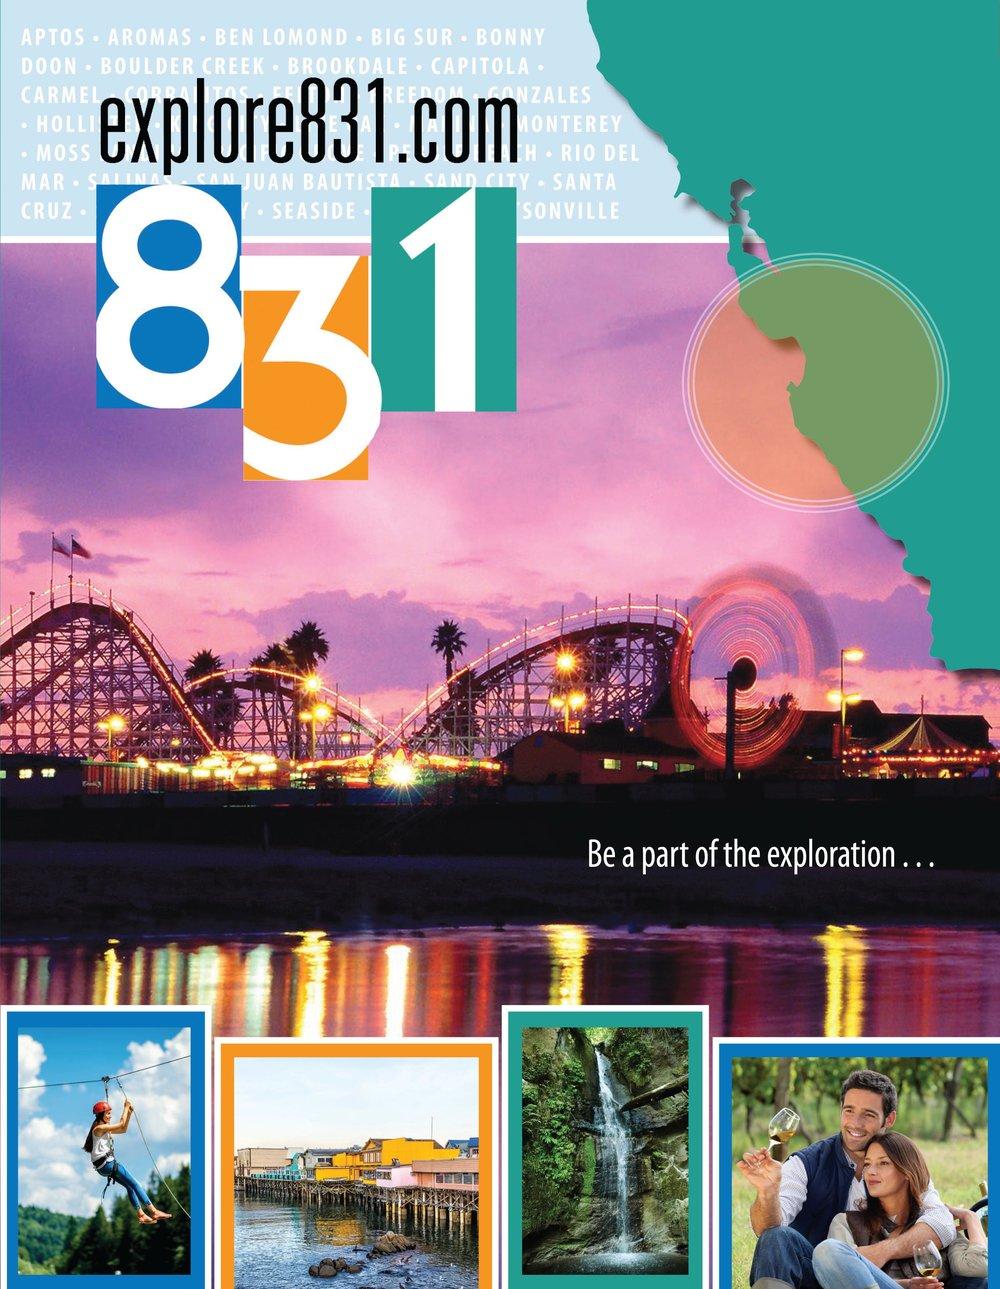 Explore831_mediakit_frontcover-1.jpg